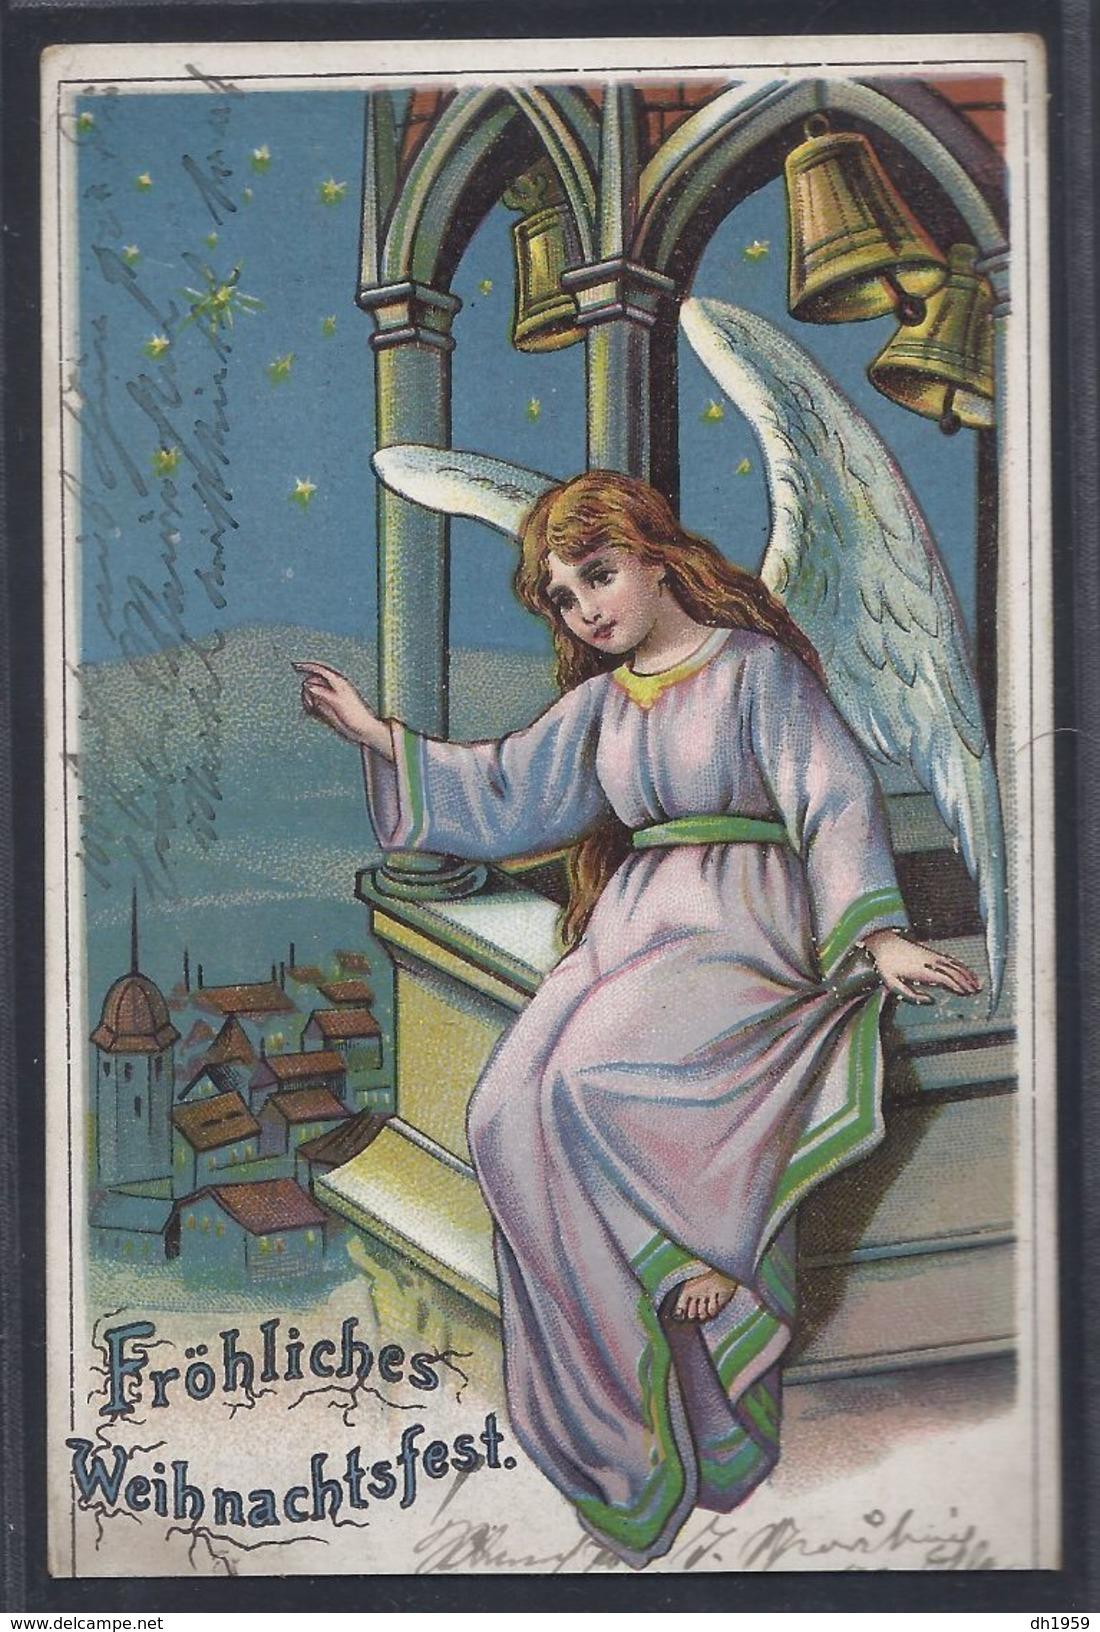 TSINGTAU KIAUTSCHOU 1904 CHINE CHINA KIAUTCHOU Pour STRASBOURG Sur Carte Voeux Noel Weihnachten Ange Angel Engel - Colonie: Kiautchou